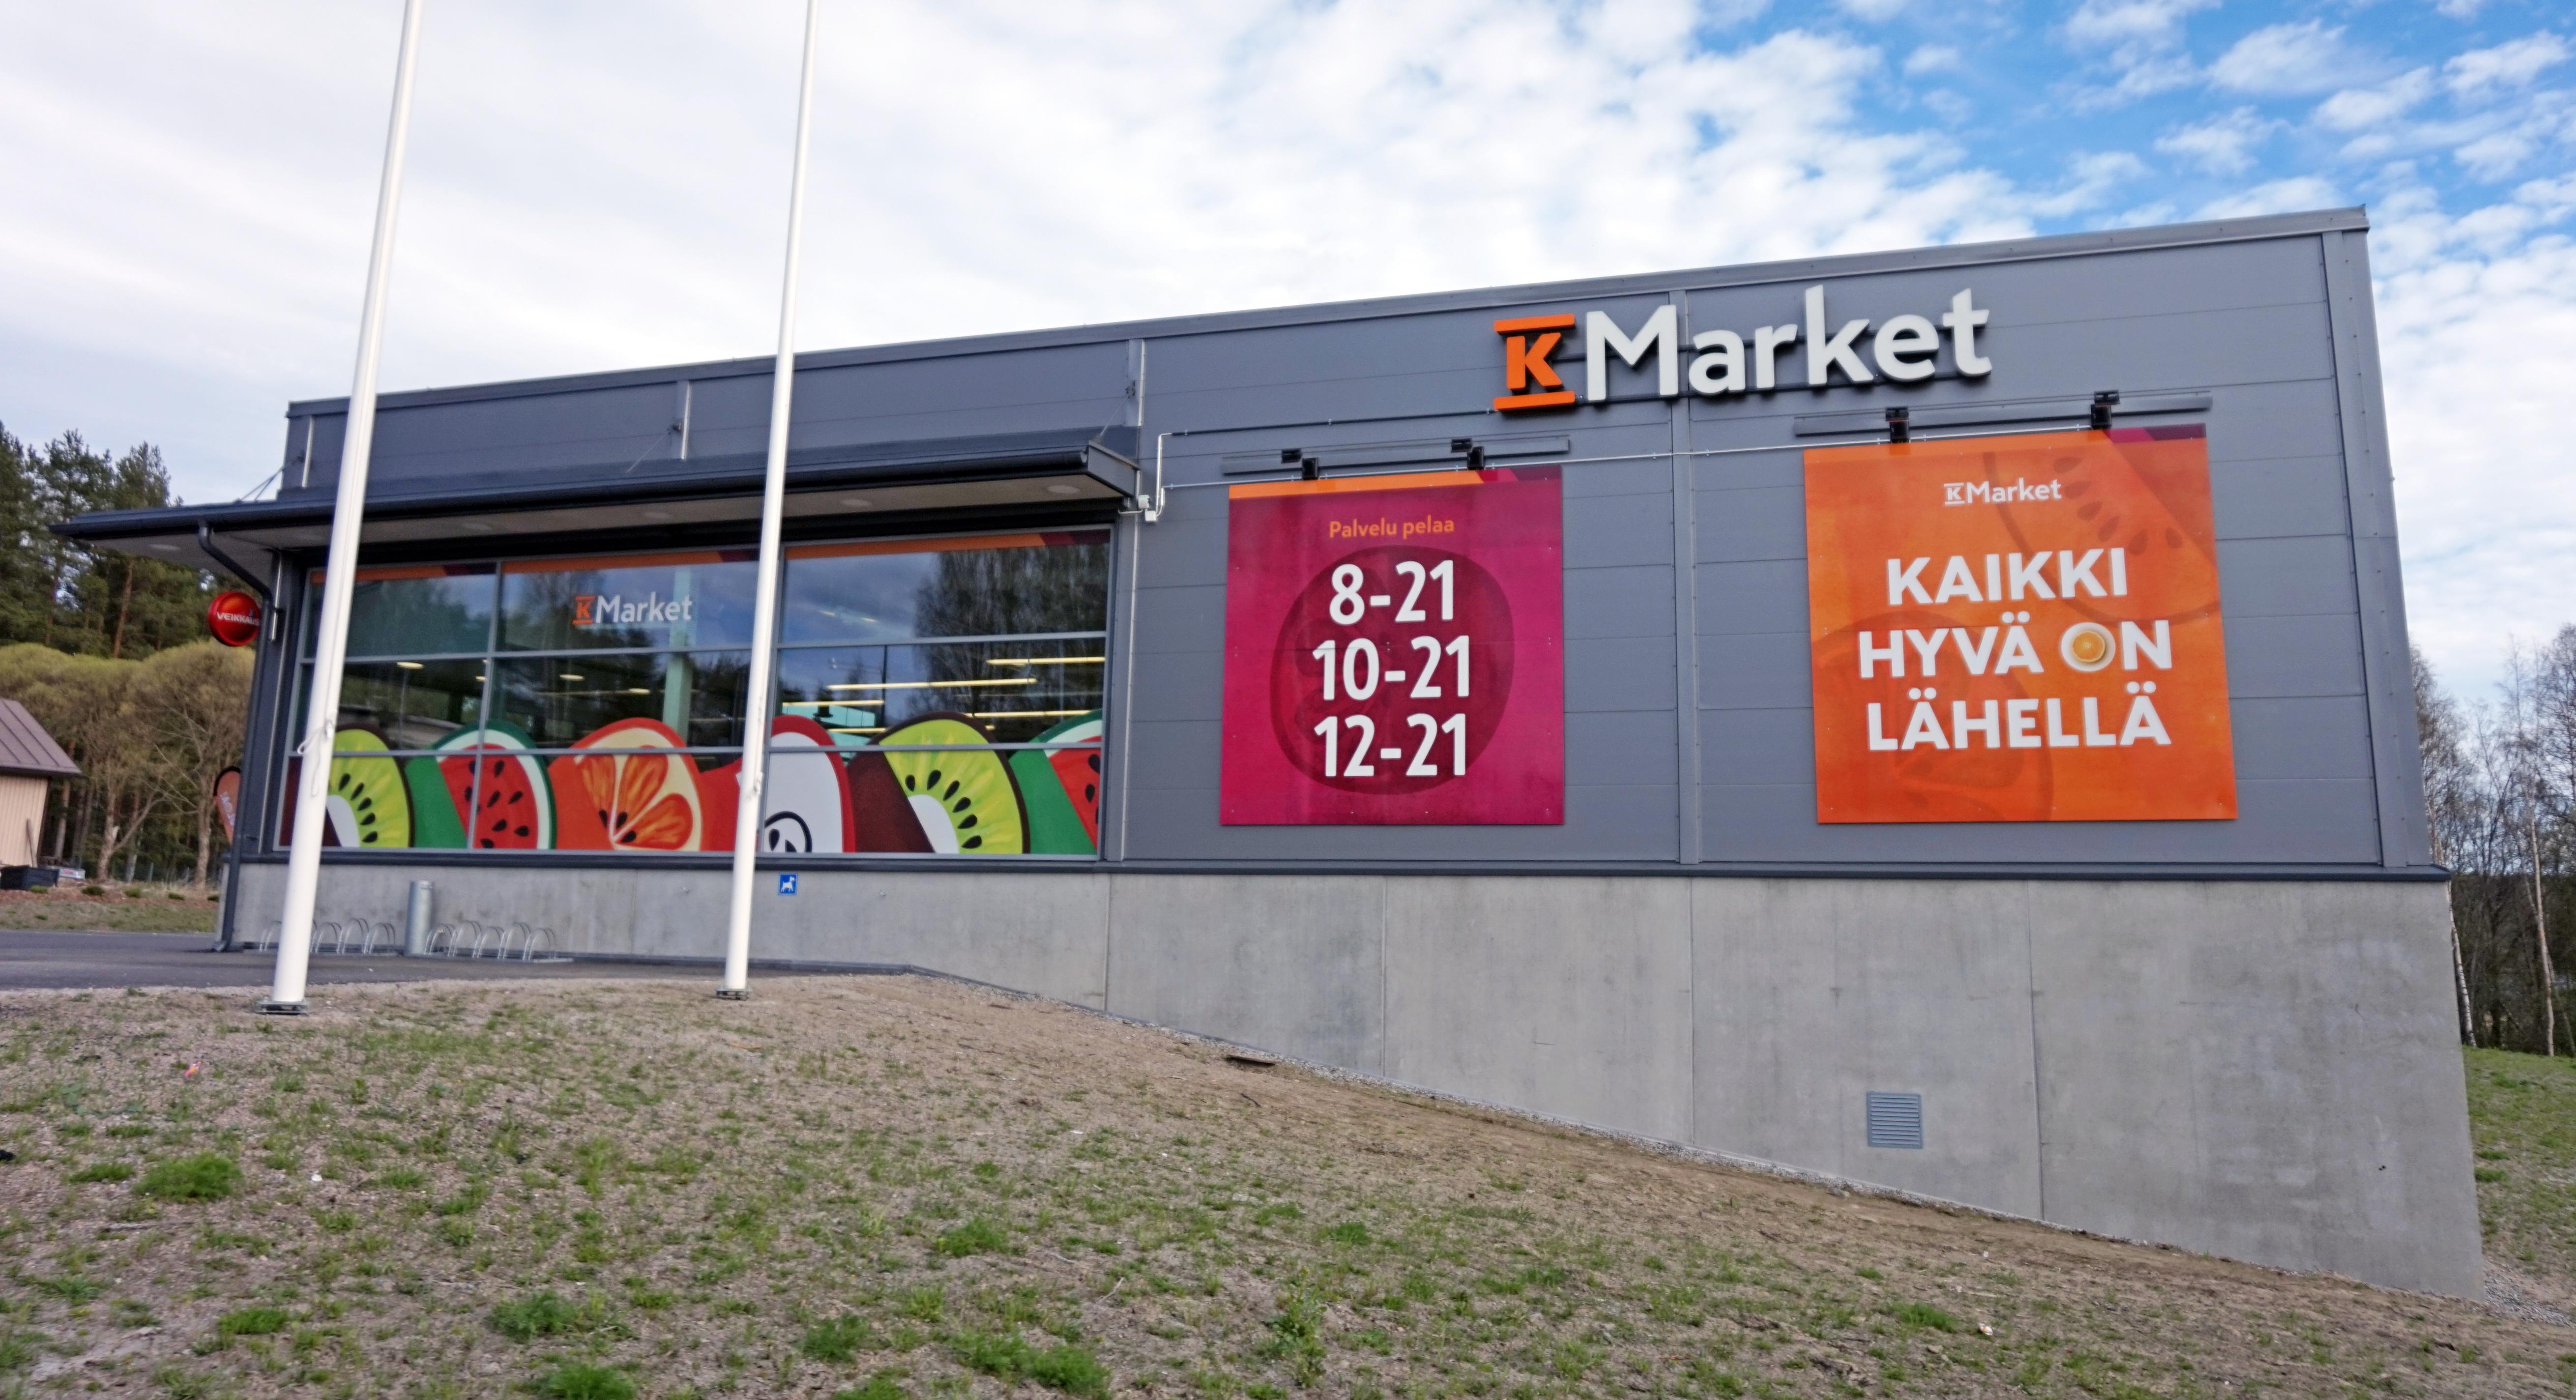 K Market Eväskontti